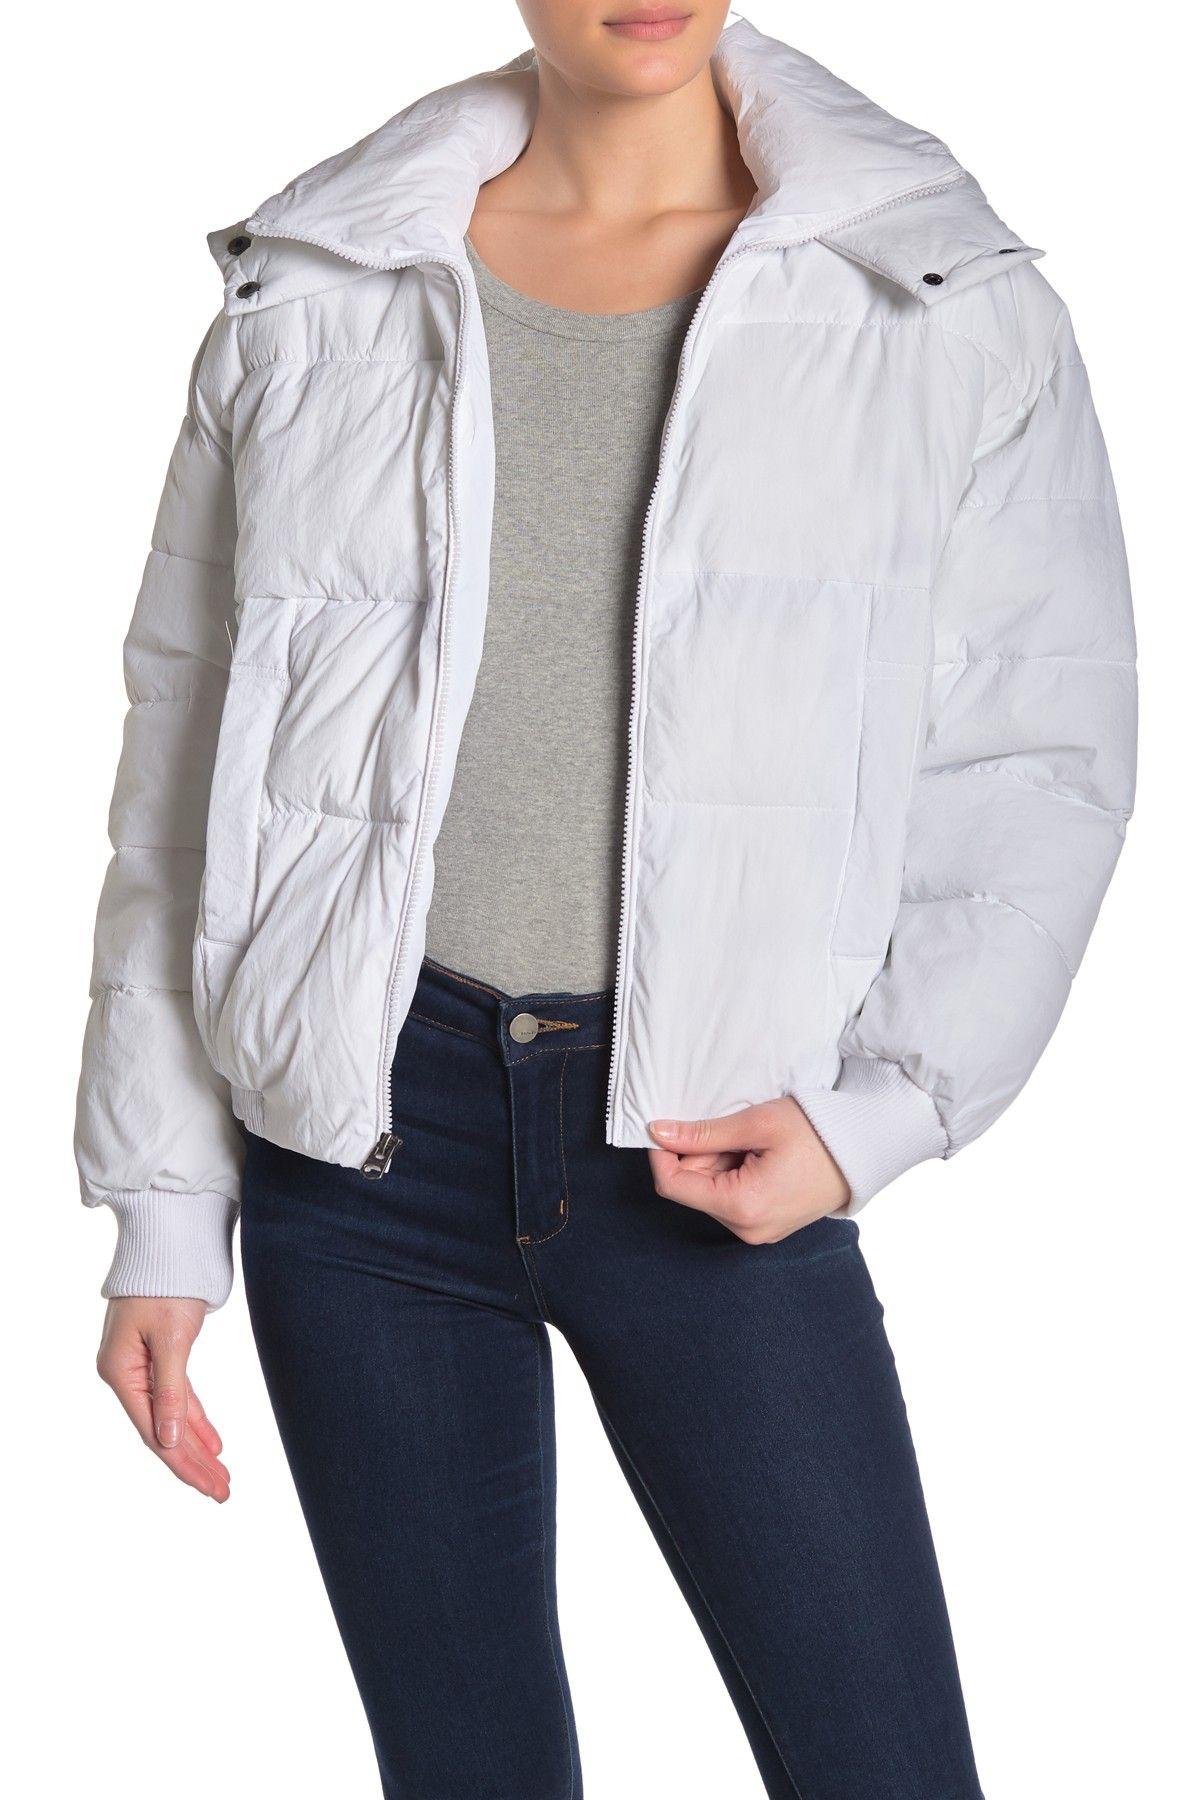 Lucky Brand Missy Short Puffer Jacket Nordstrom Rack Short Puffer Jacket Lucky Brand Jackets [ 1800 x 1200 Pixel ]